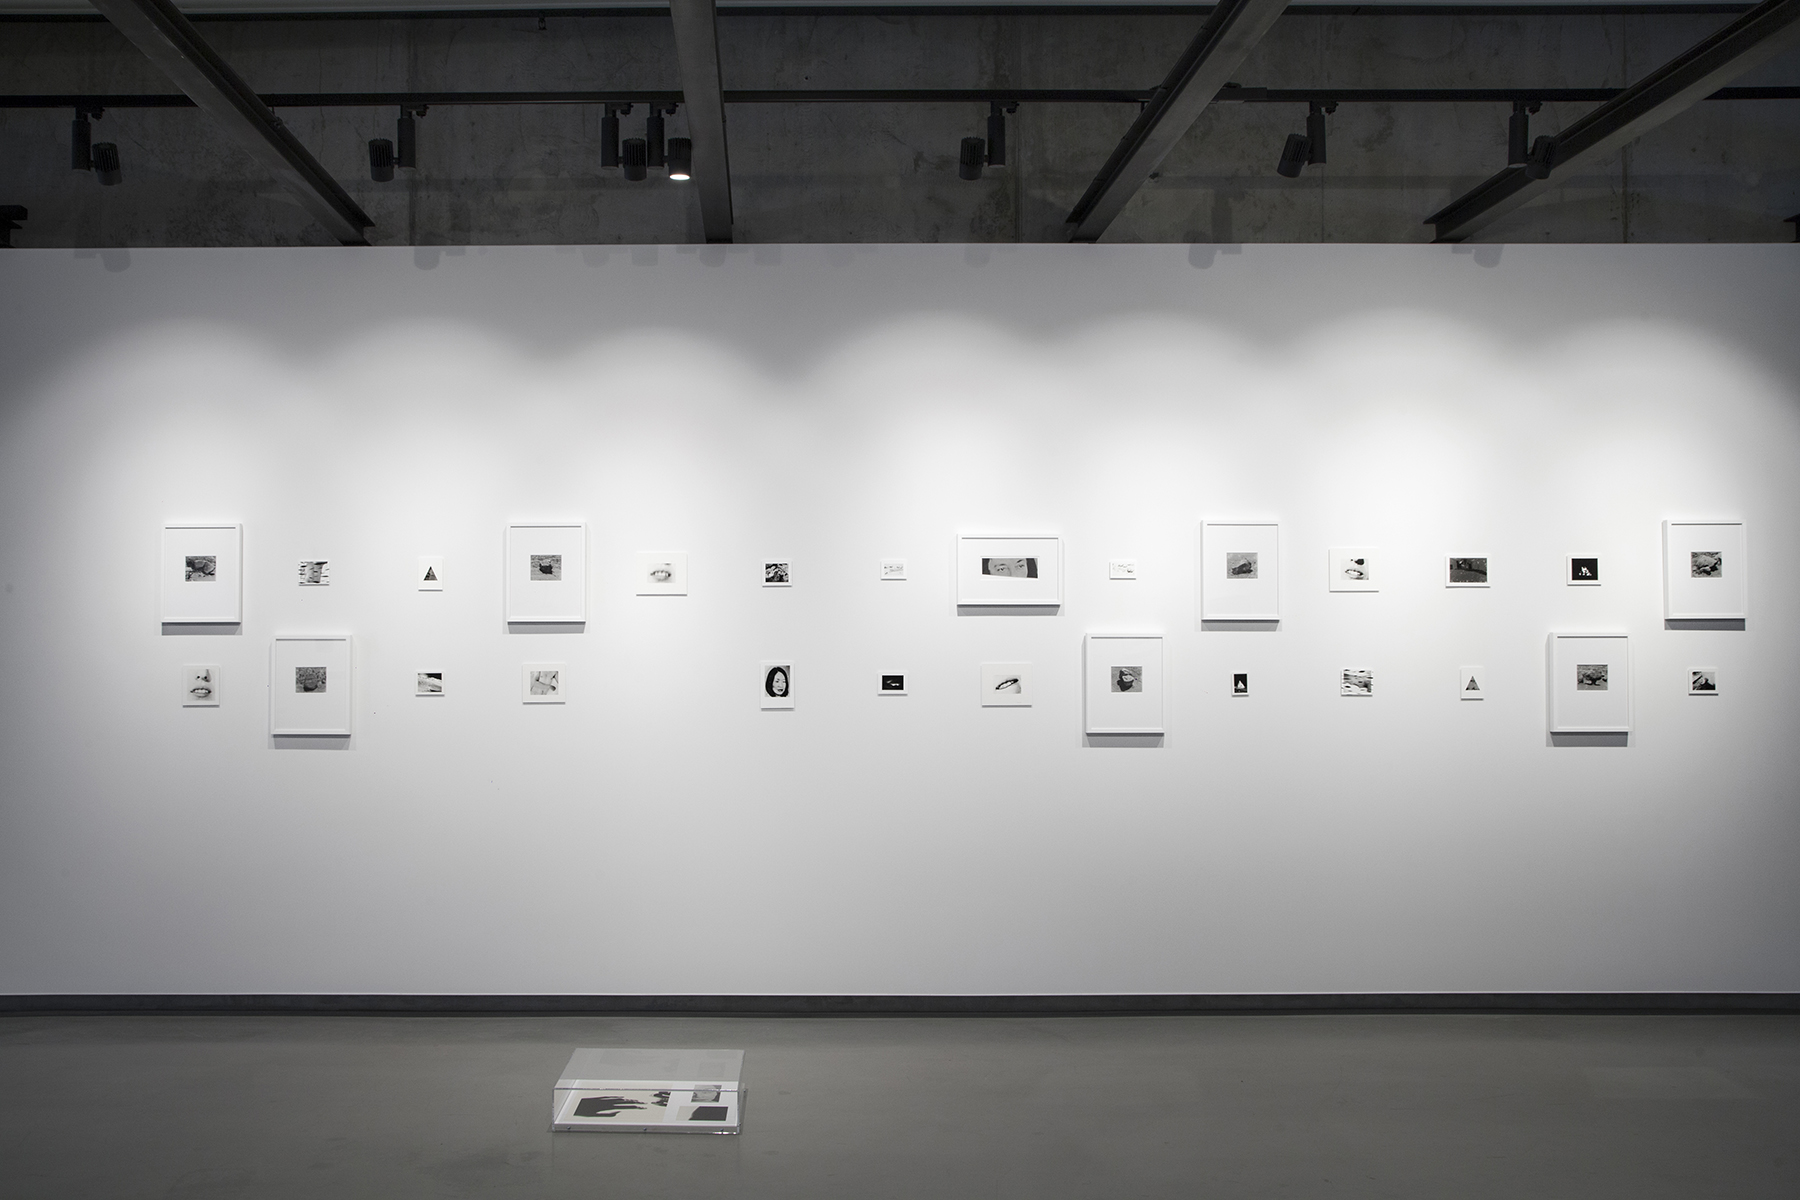 Deanna Pizzitelli, New Generation Photography Award, Exhibition at On Site Gallery, May - June 2018. Photo by Yuula Benivolski